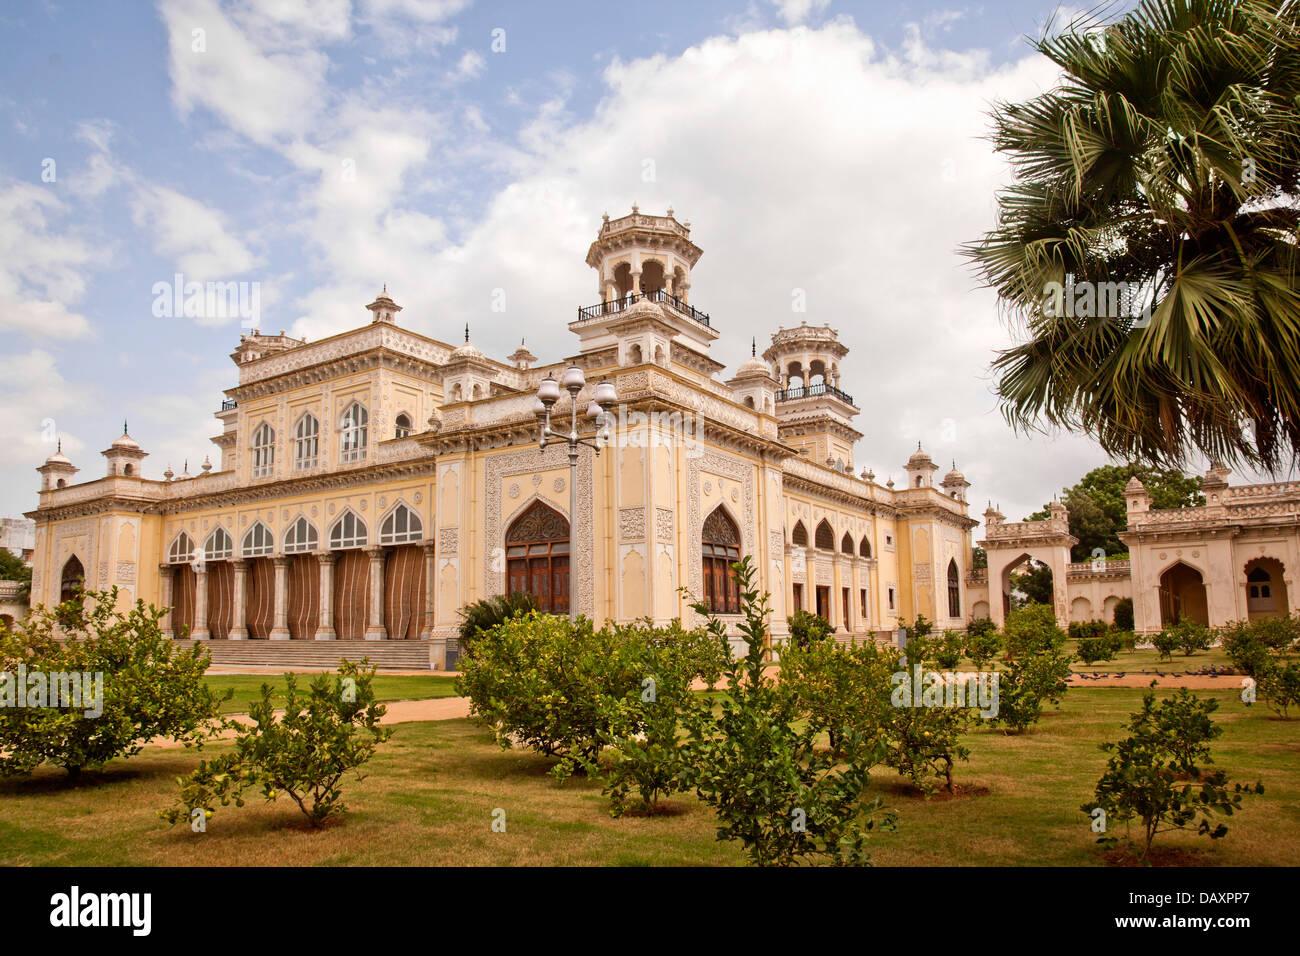 Facciata di un palazzo, Chowmahalla Palace, Hyderabad, Andhra Pradesh, India Immagini Stock